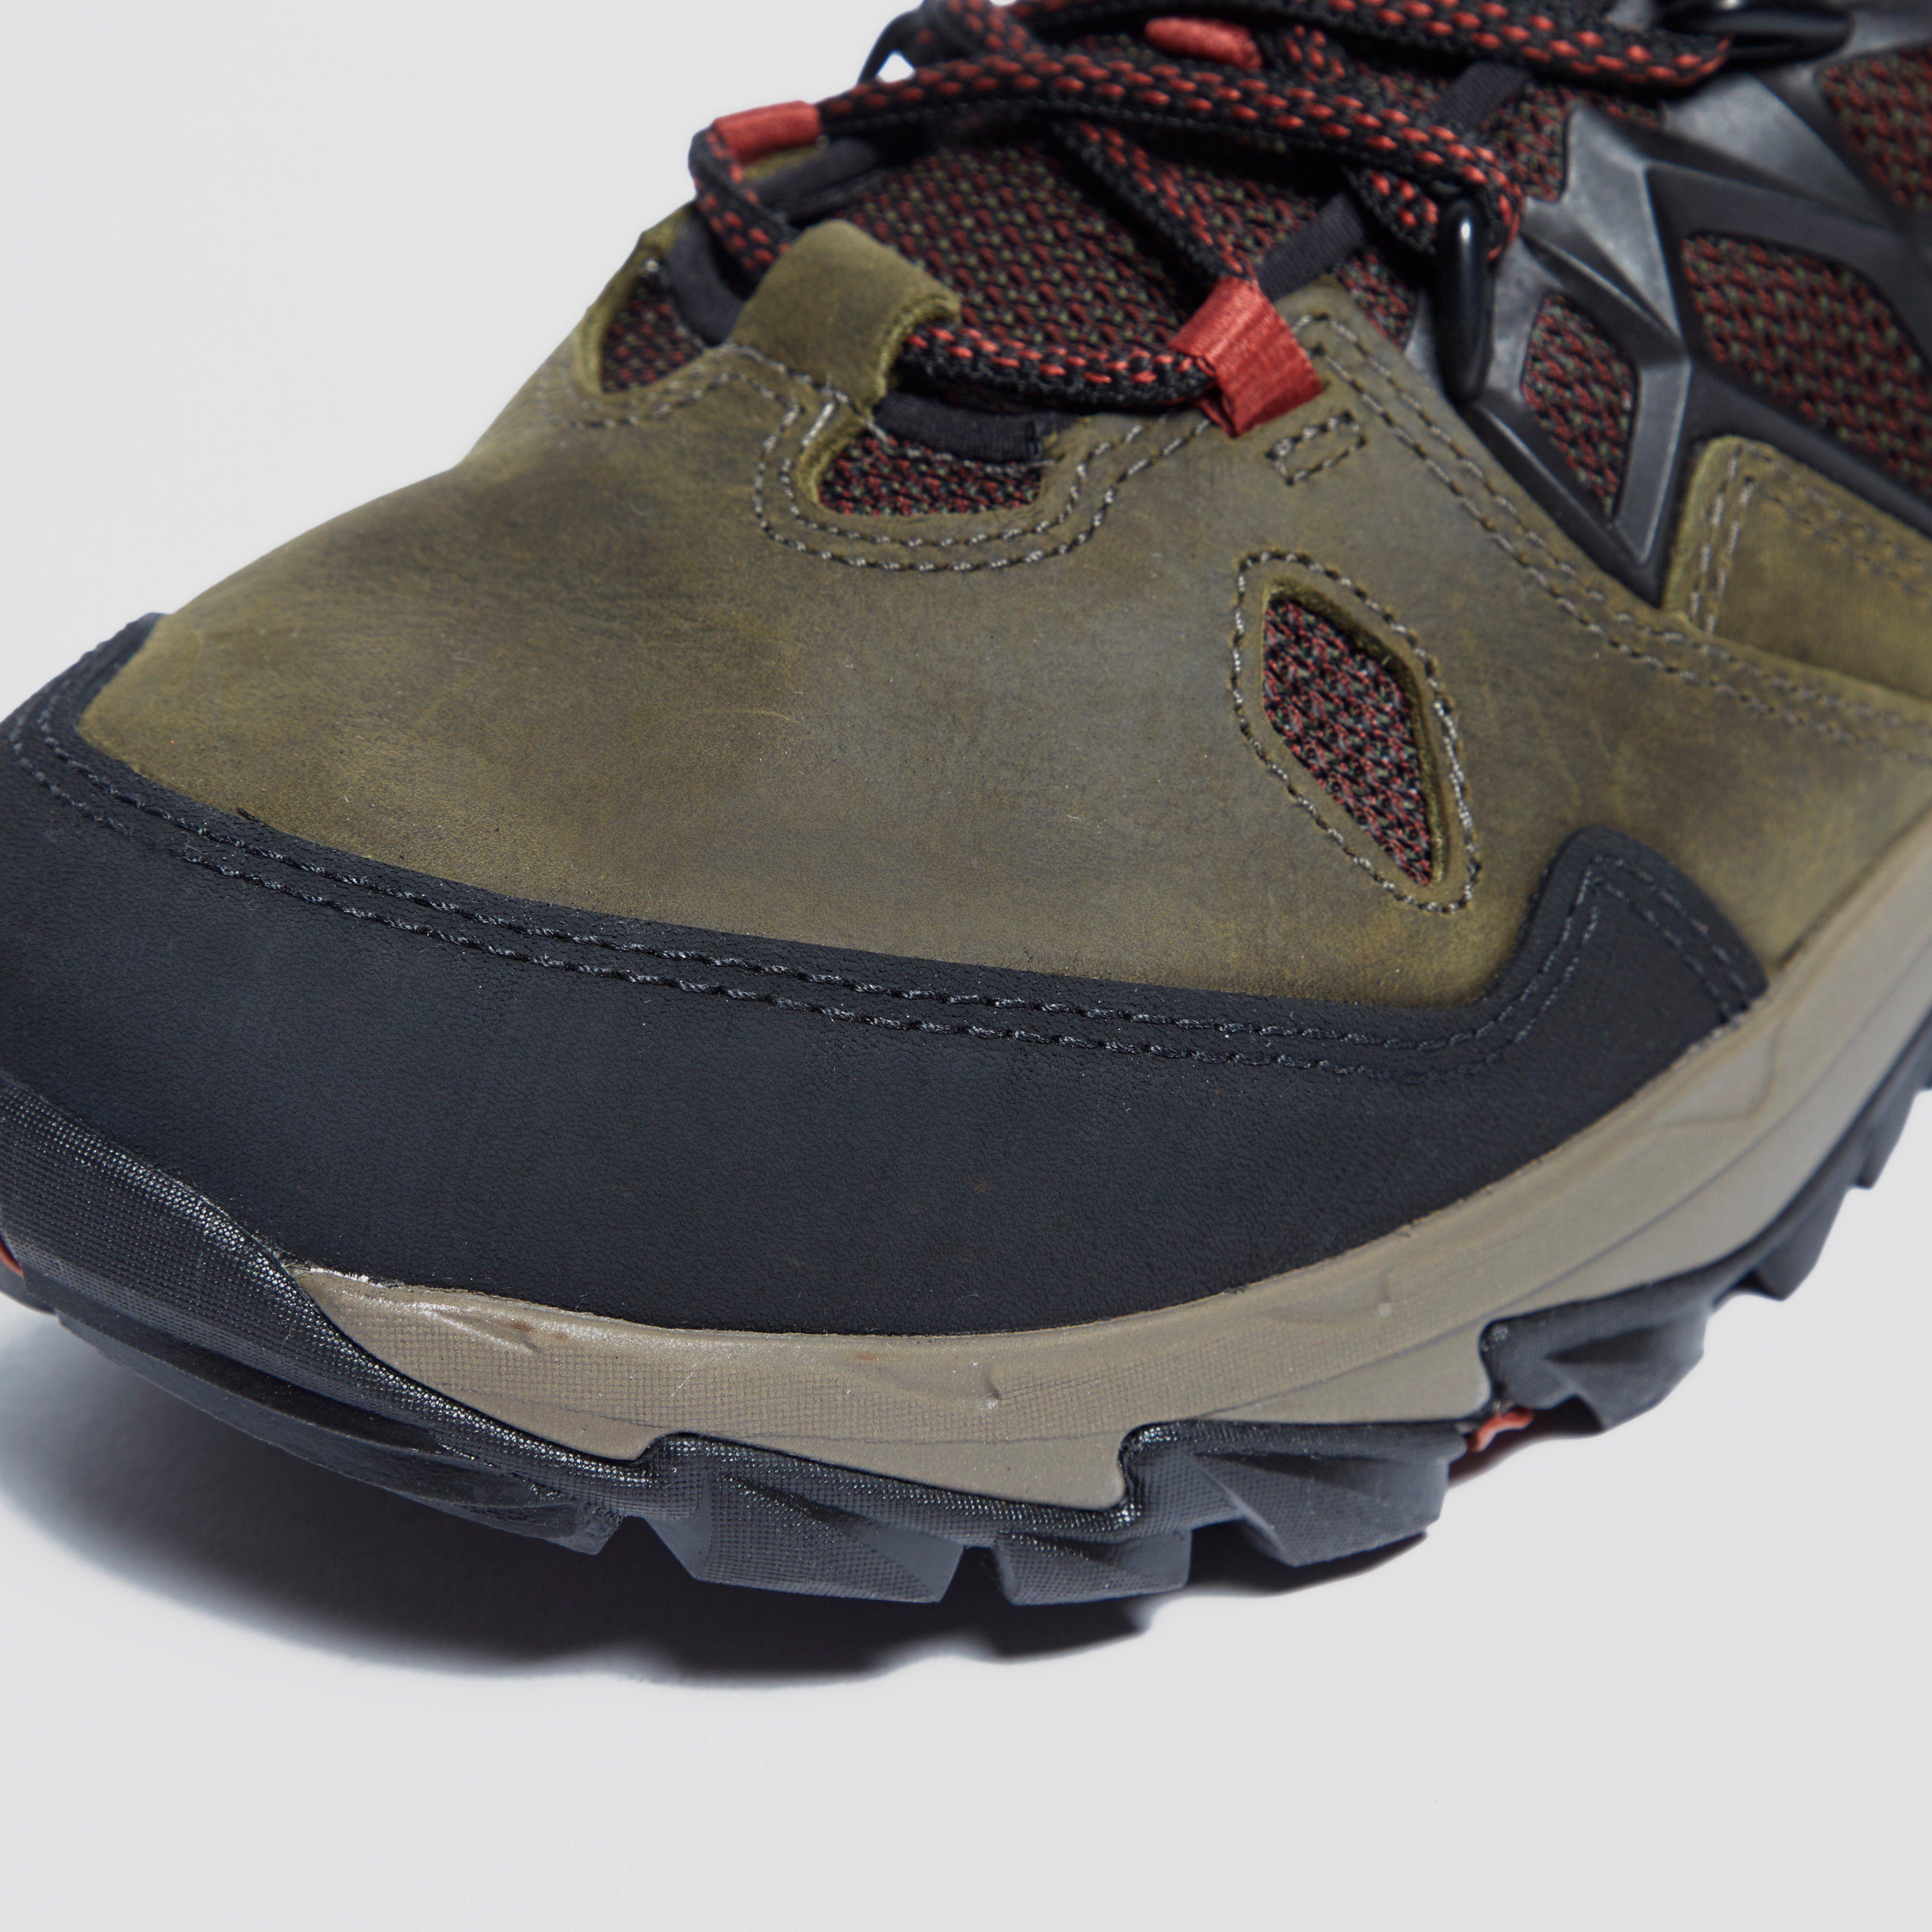 Merrell All Out Blaze 2 GTX Men's Hiking Shoes